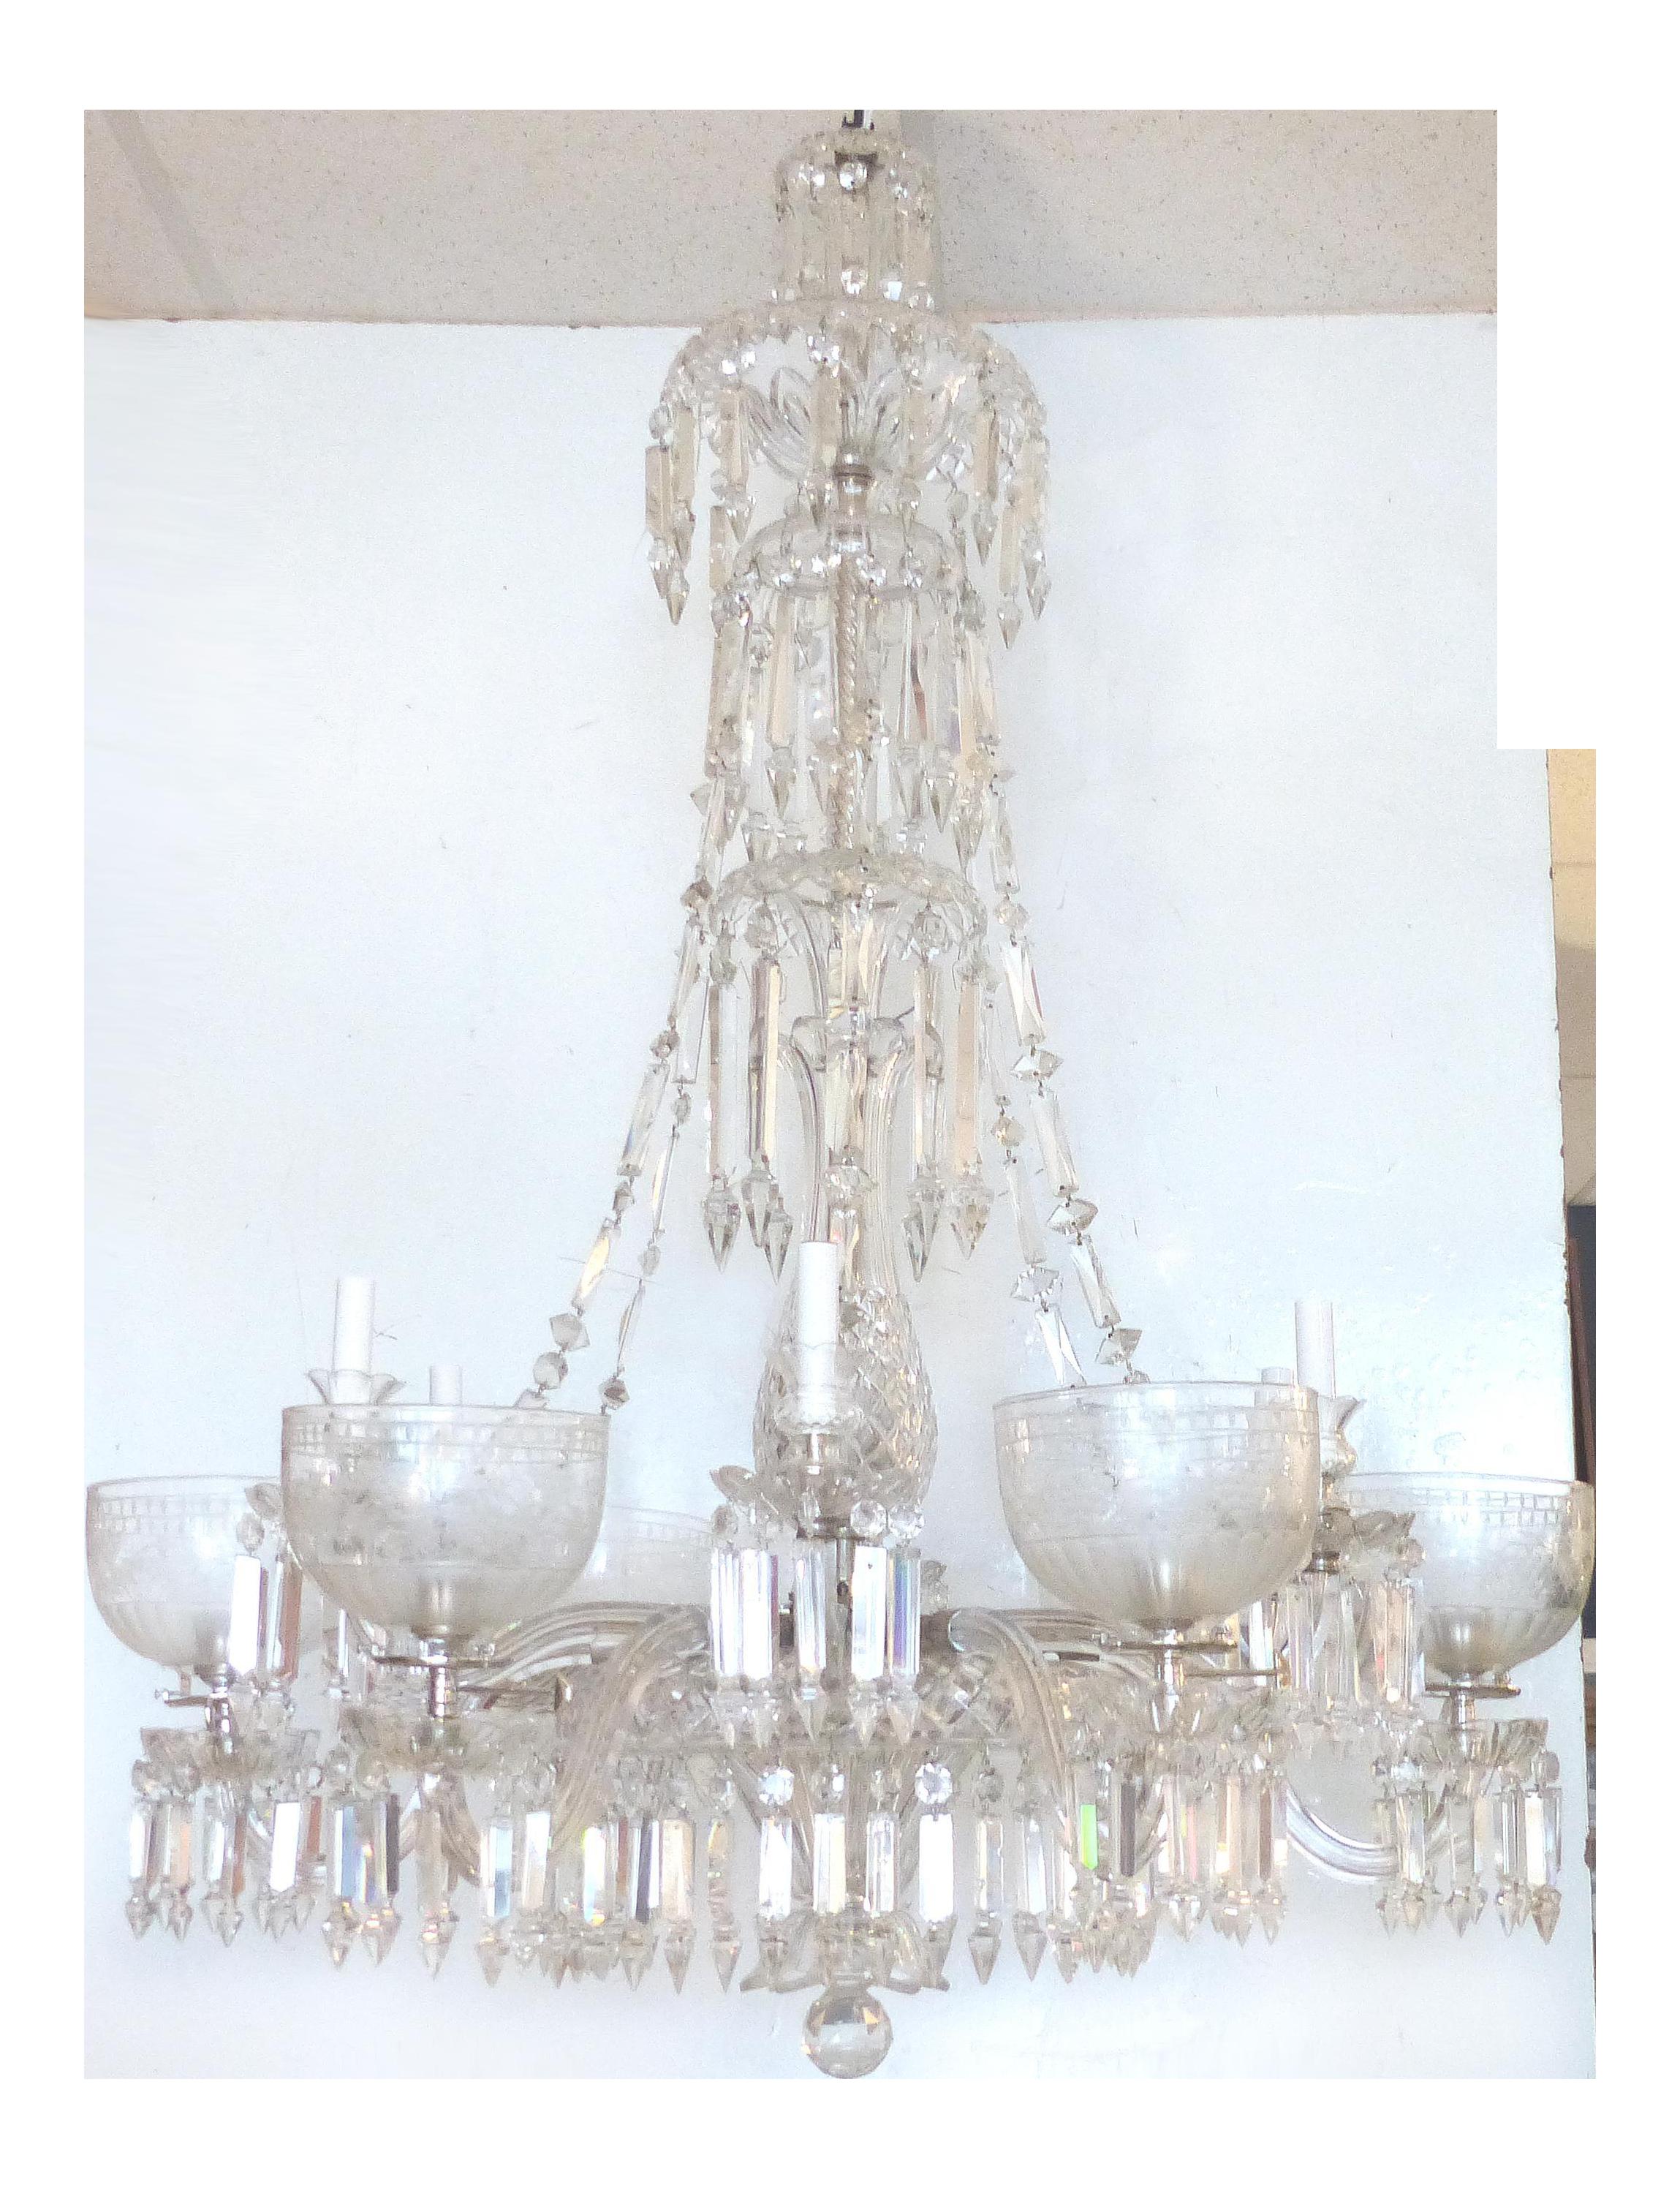 Fine english 19th century twelve arm cut crystal gas chandelier by fine english 19th century twelve arm cut crystal gas chandelier by f c osler decaso arubaitofo Gallery